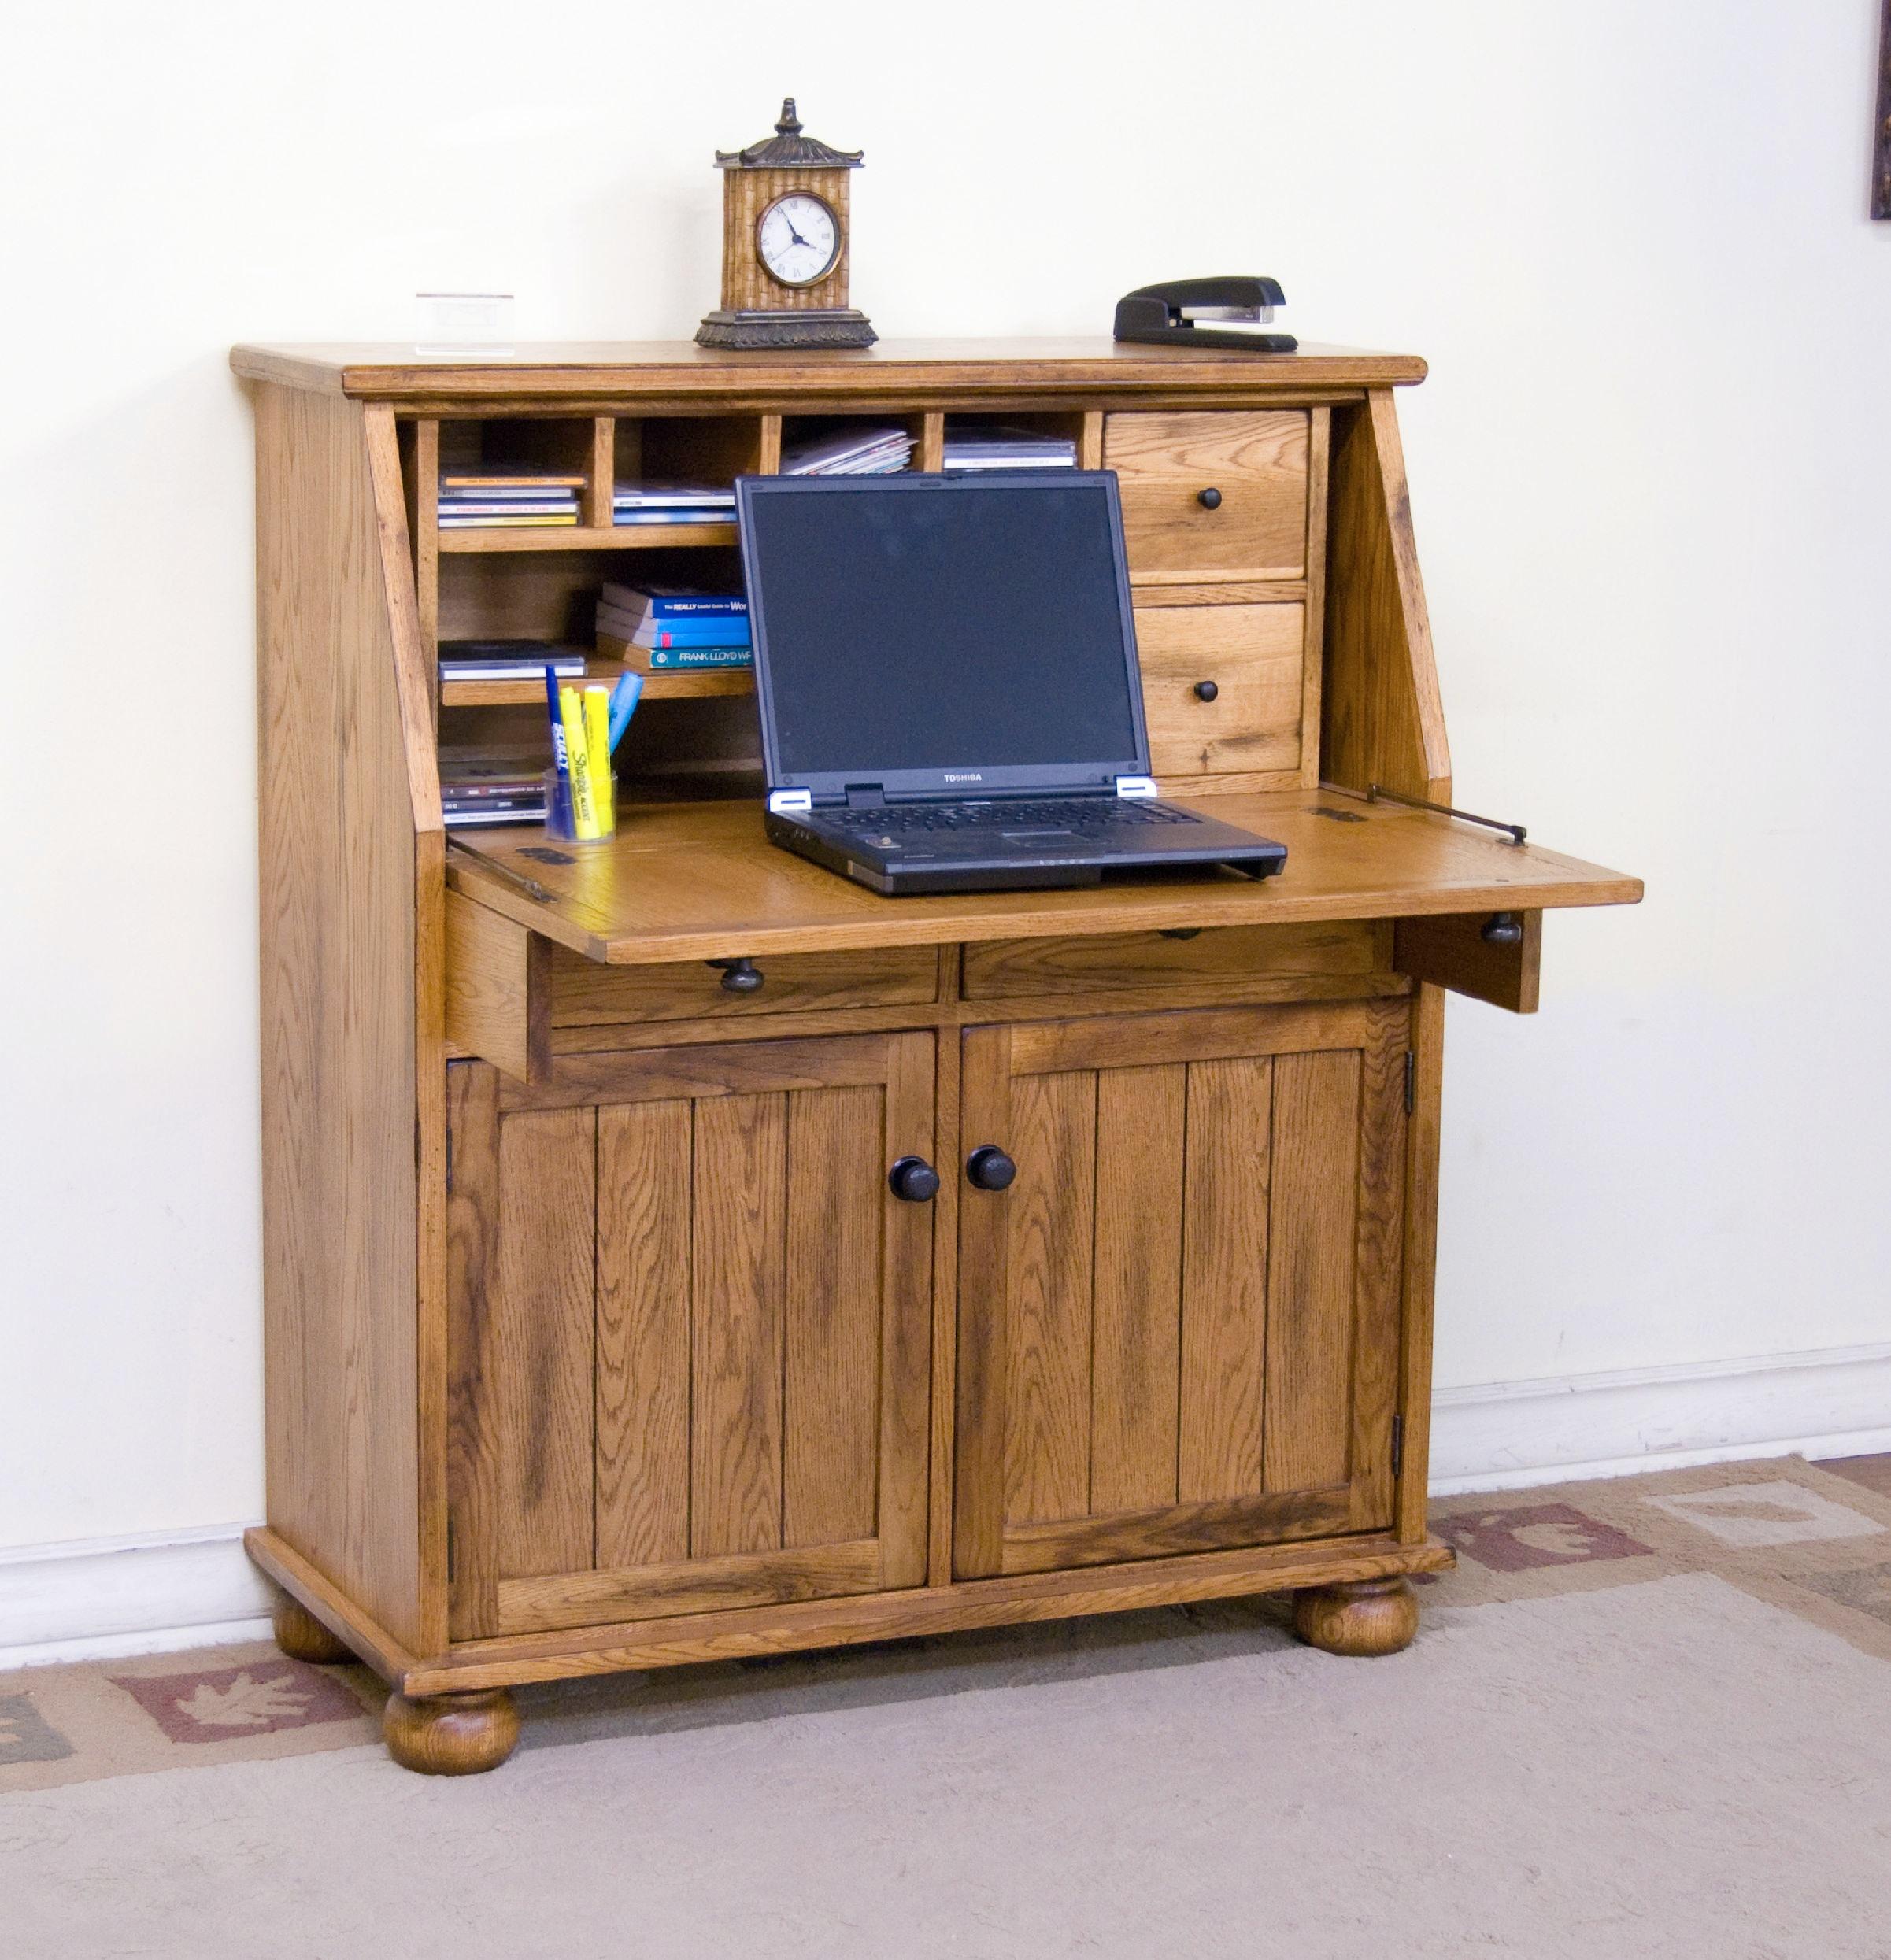 Home Office Desk Corner 30quot Led Light Bar Wiring Harness Lty Promo 2939ro Halffitfill